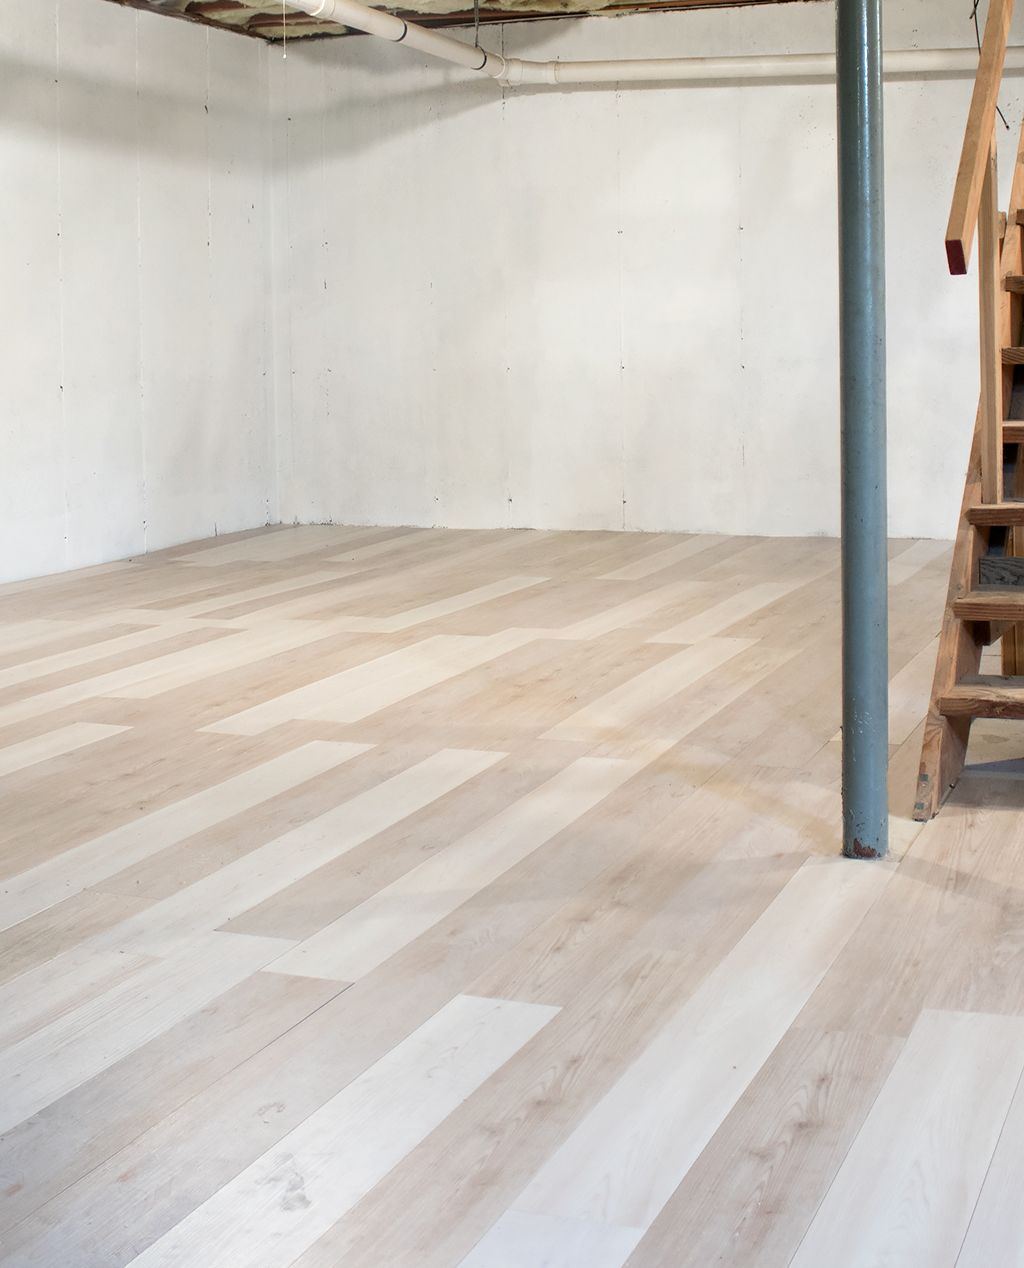 Installing Luxury Vinyl Plank Flooring First Phase of